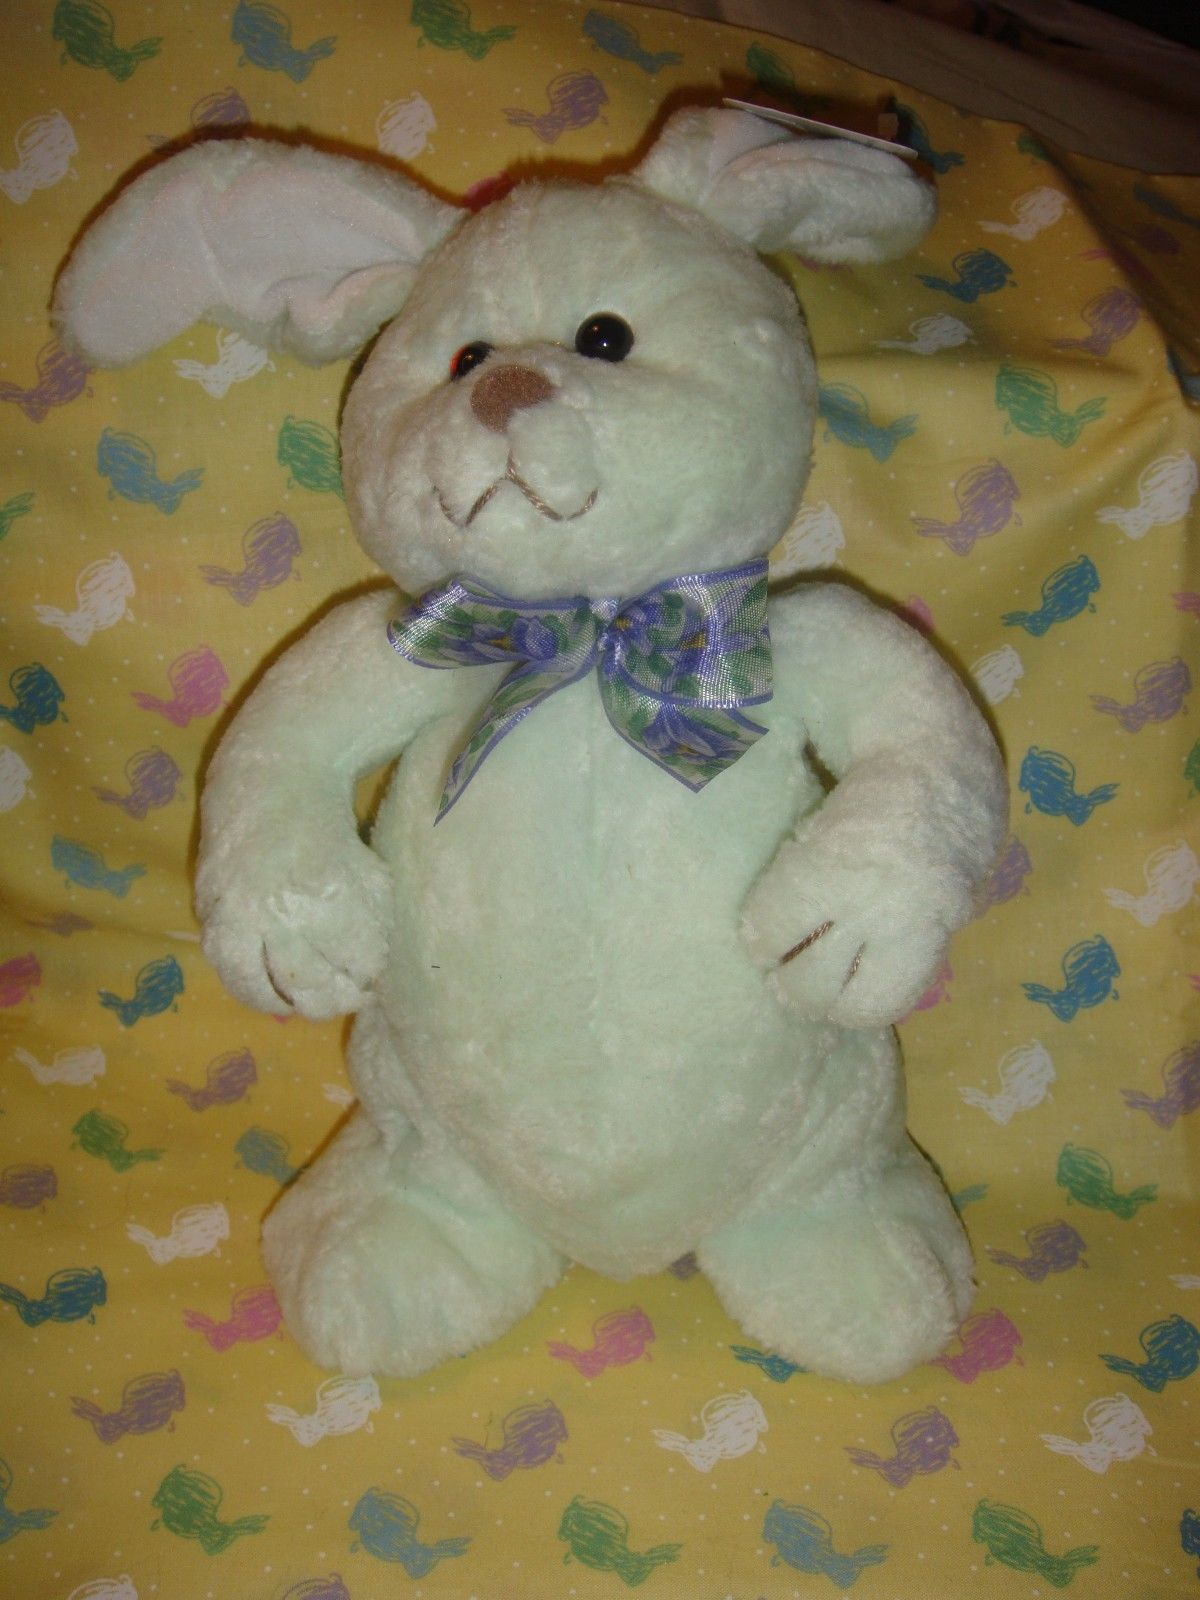 Gund Pastel Green Smoothie Plush Bunny Rabbit, #3611